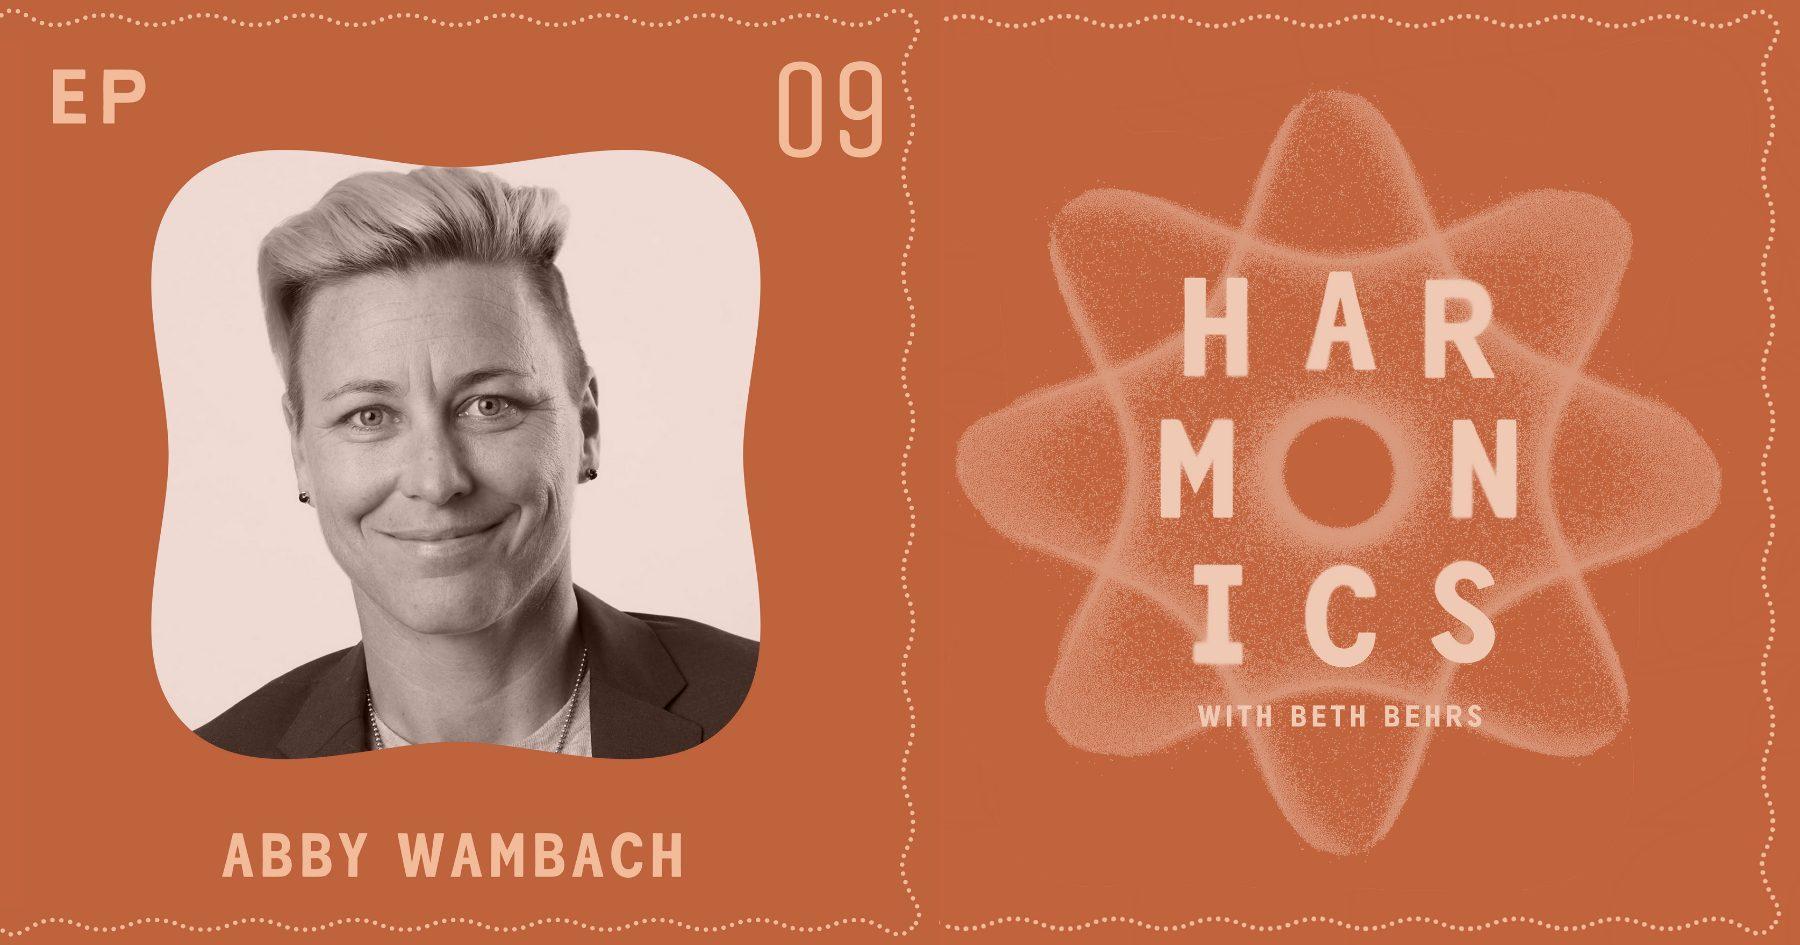 Harmonics with Beth Behrs: Abby Wambach